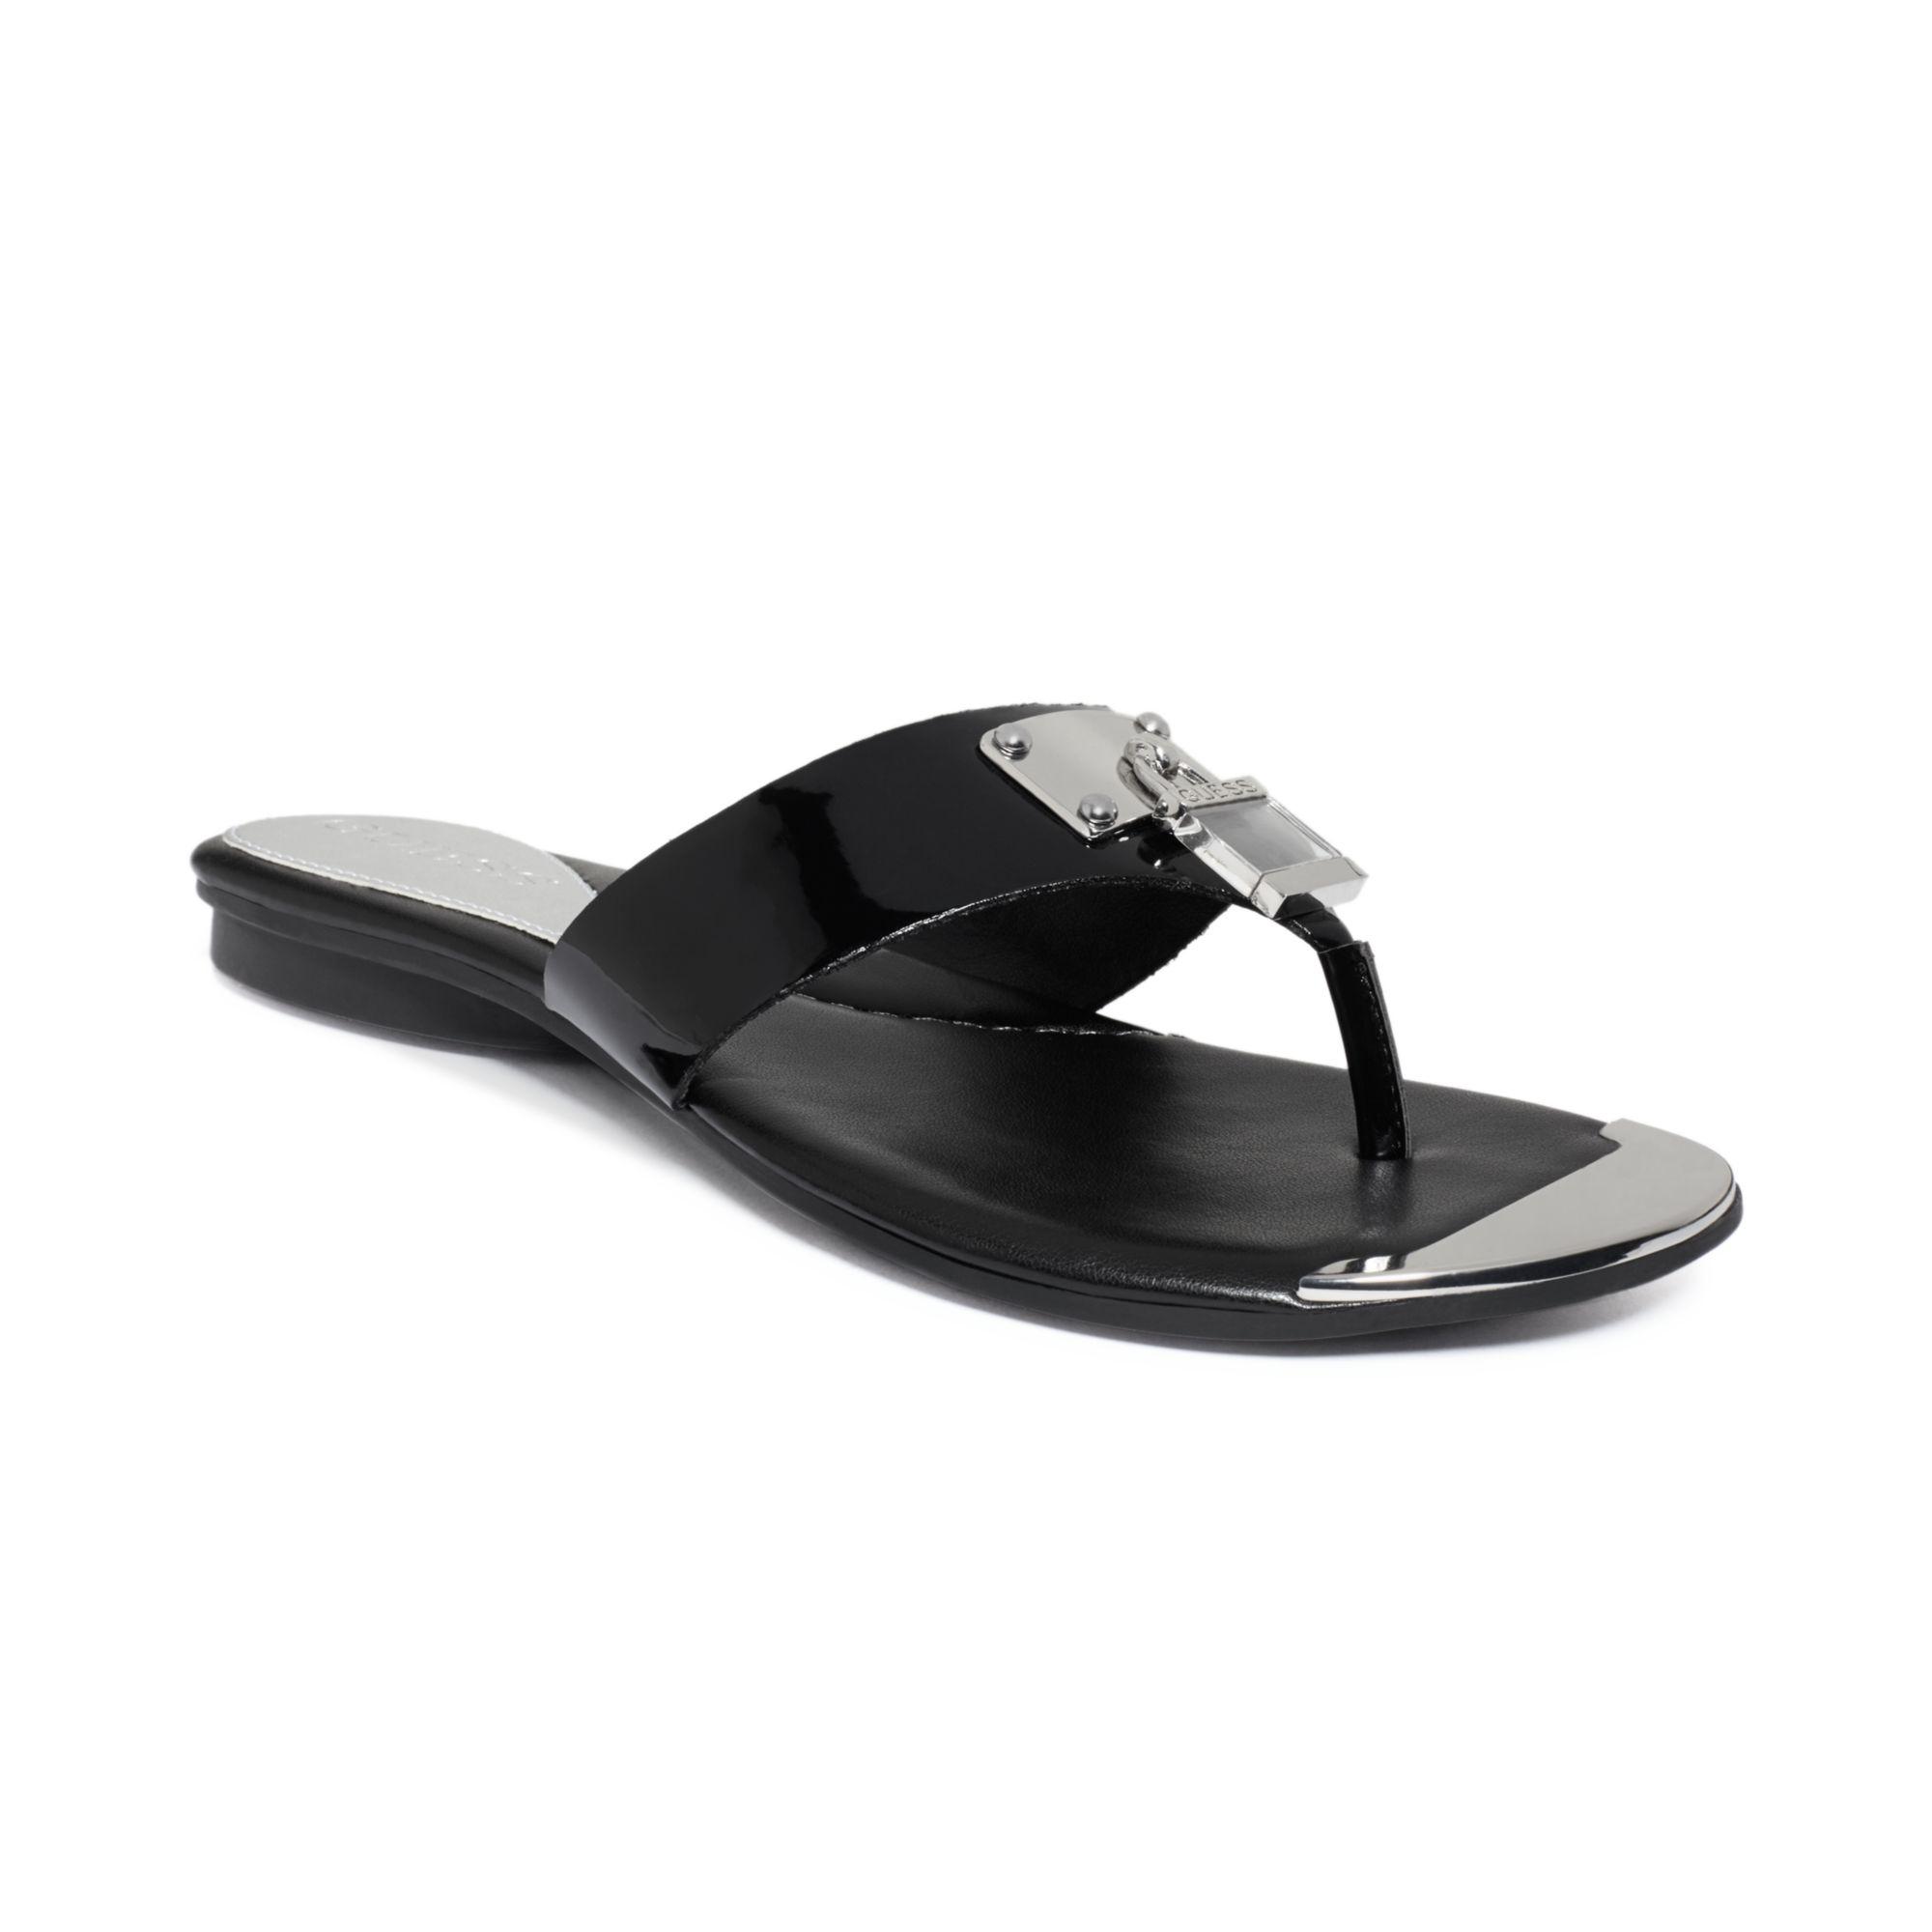 91239559e39bd6 Gallery. Previously sold at  Macy s · Women s Miu Miu Wraparound Women s  Python Sandals ...